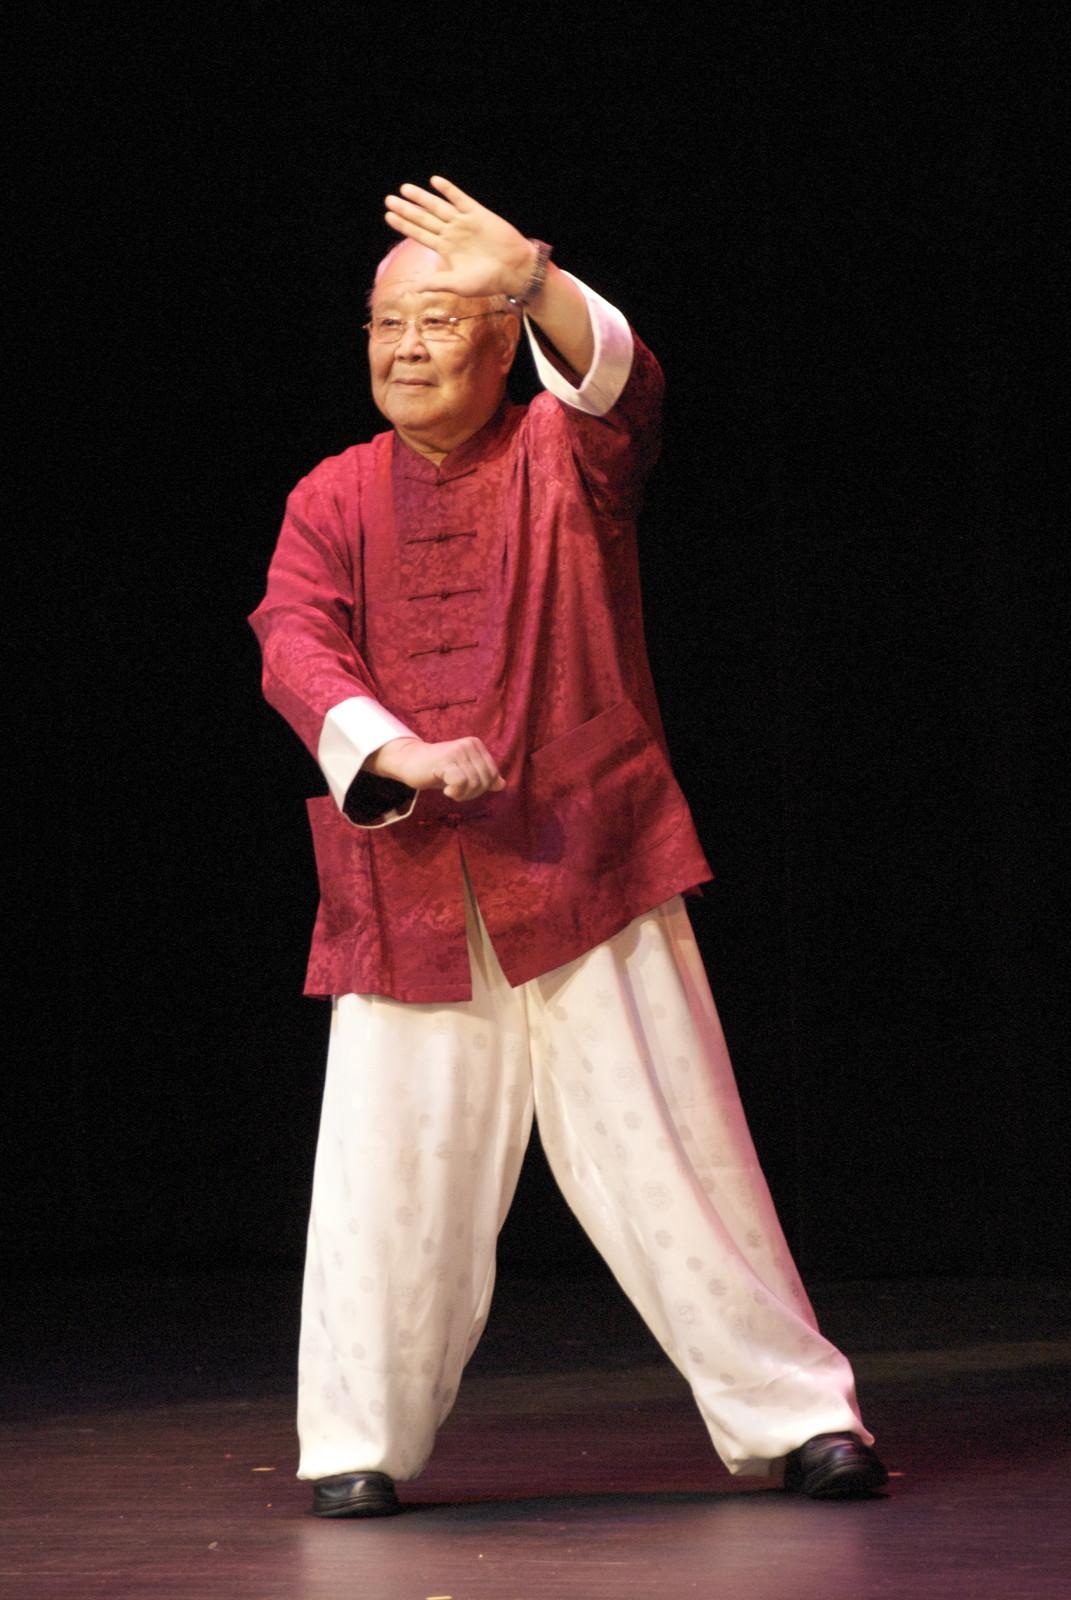 Yang Zhenduo (杨振铎) 1